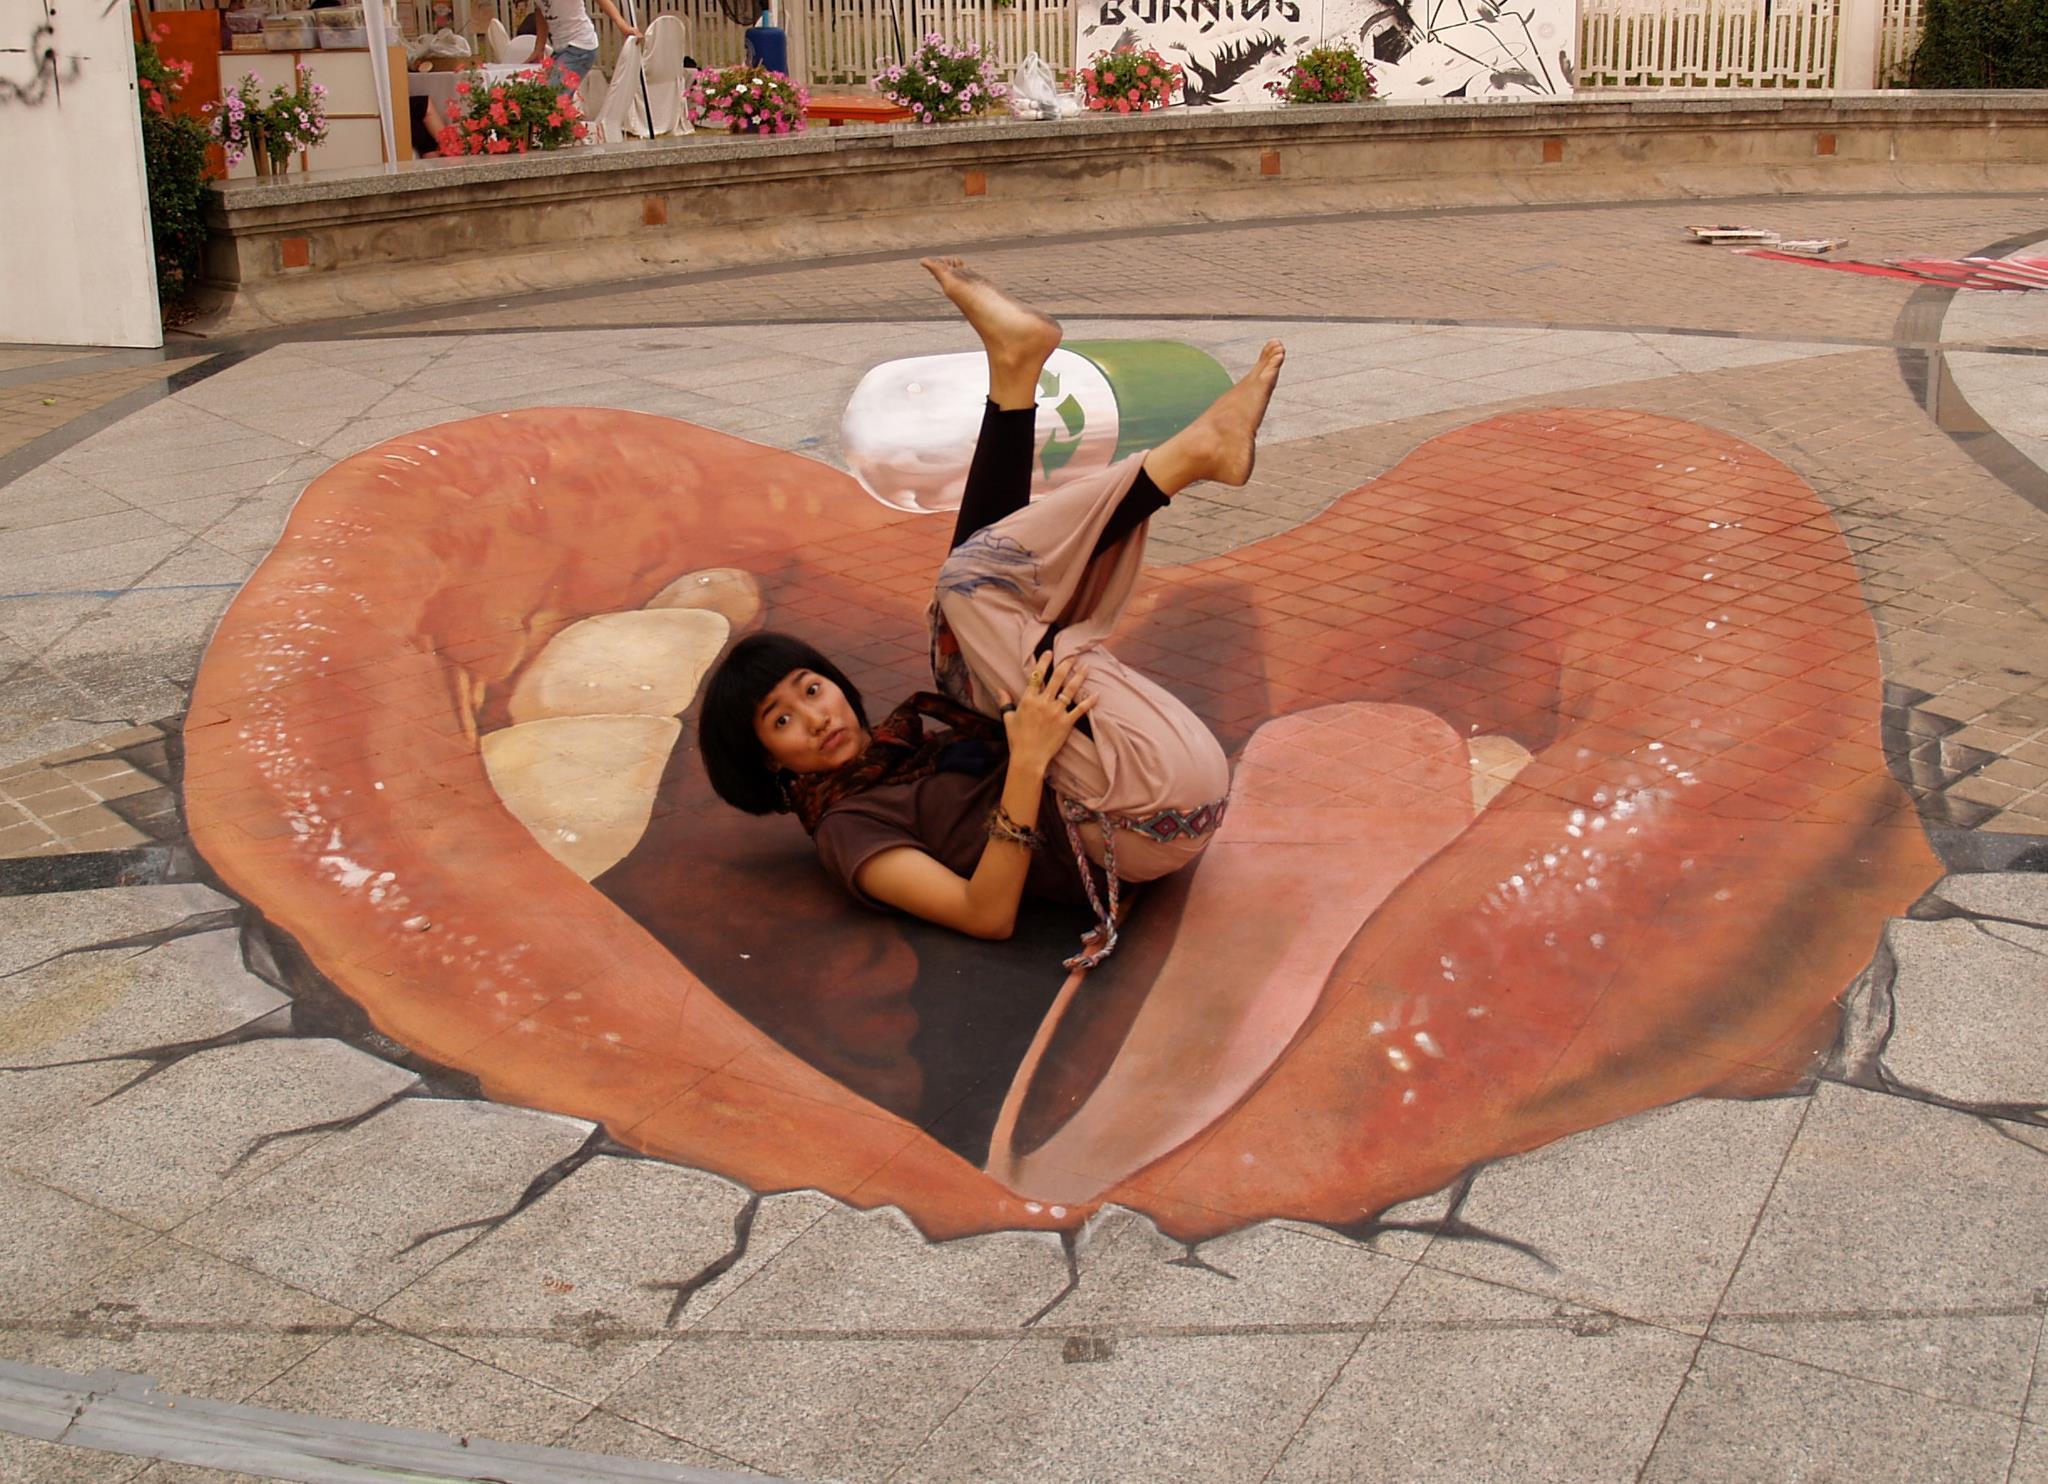 In Chiang Mai, Thailand – STREET ART UTOPIA